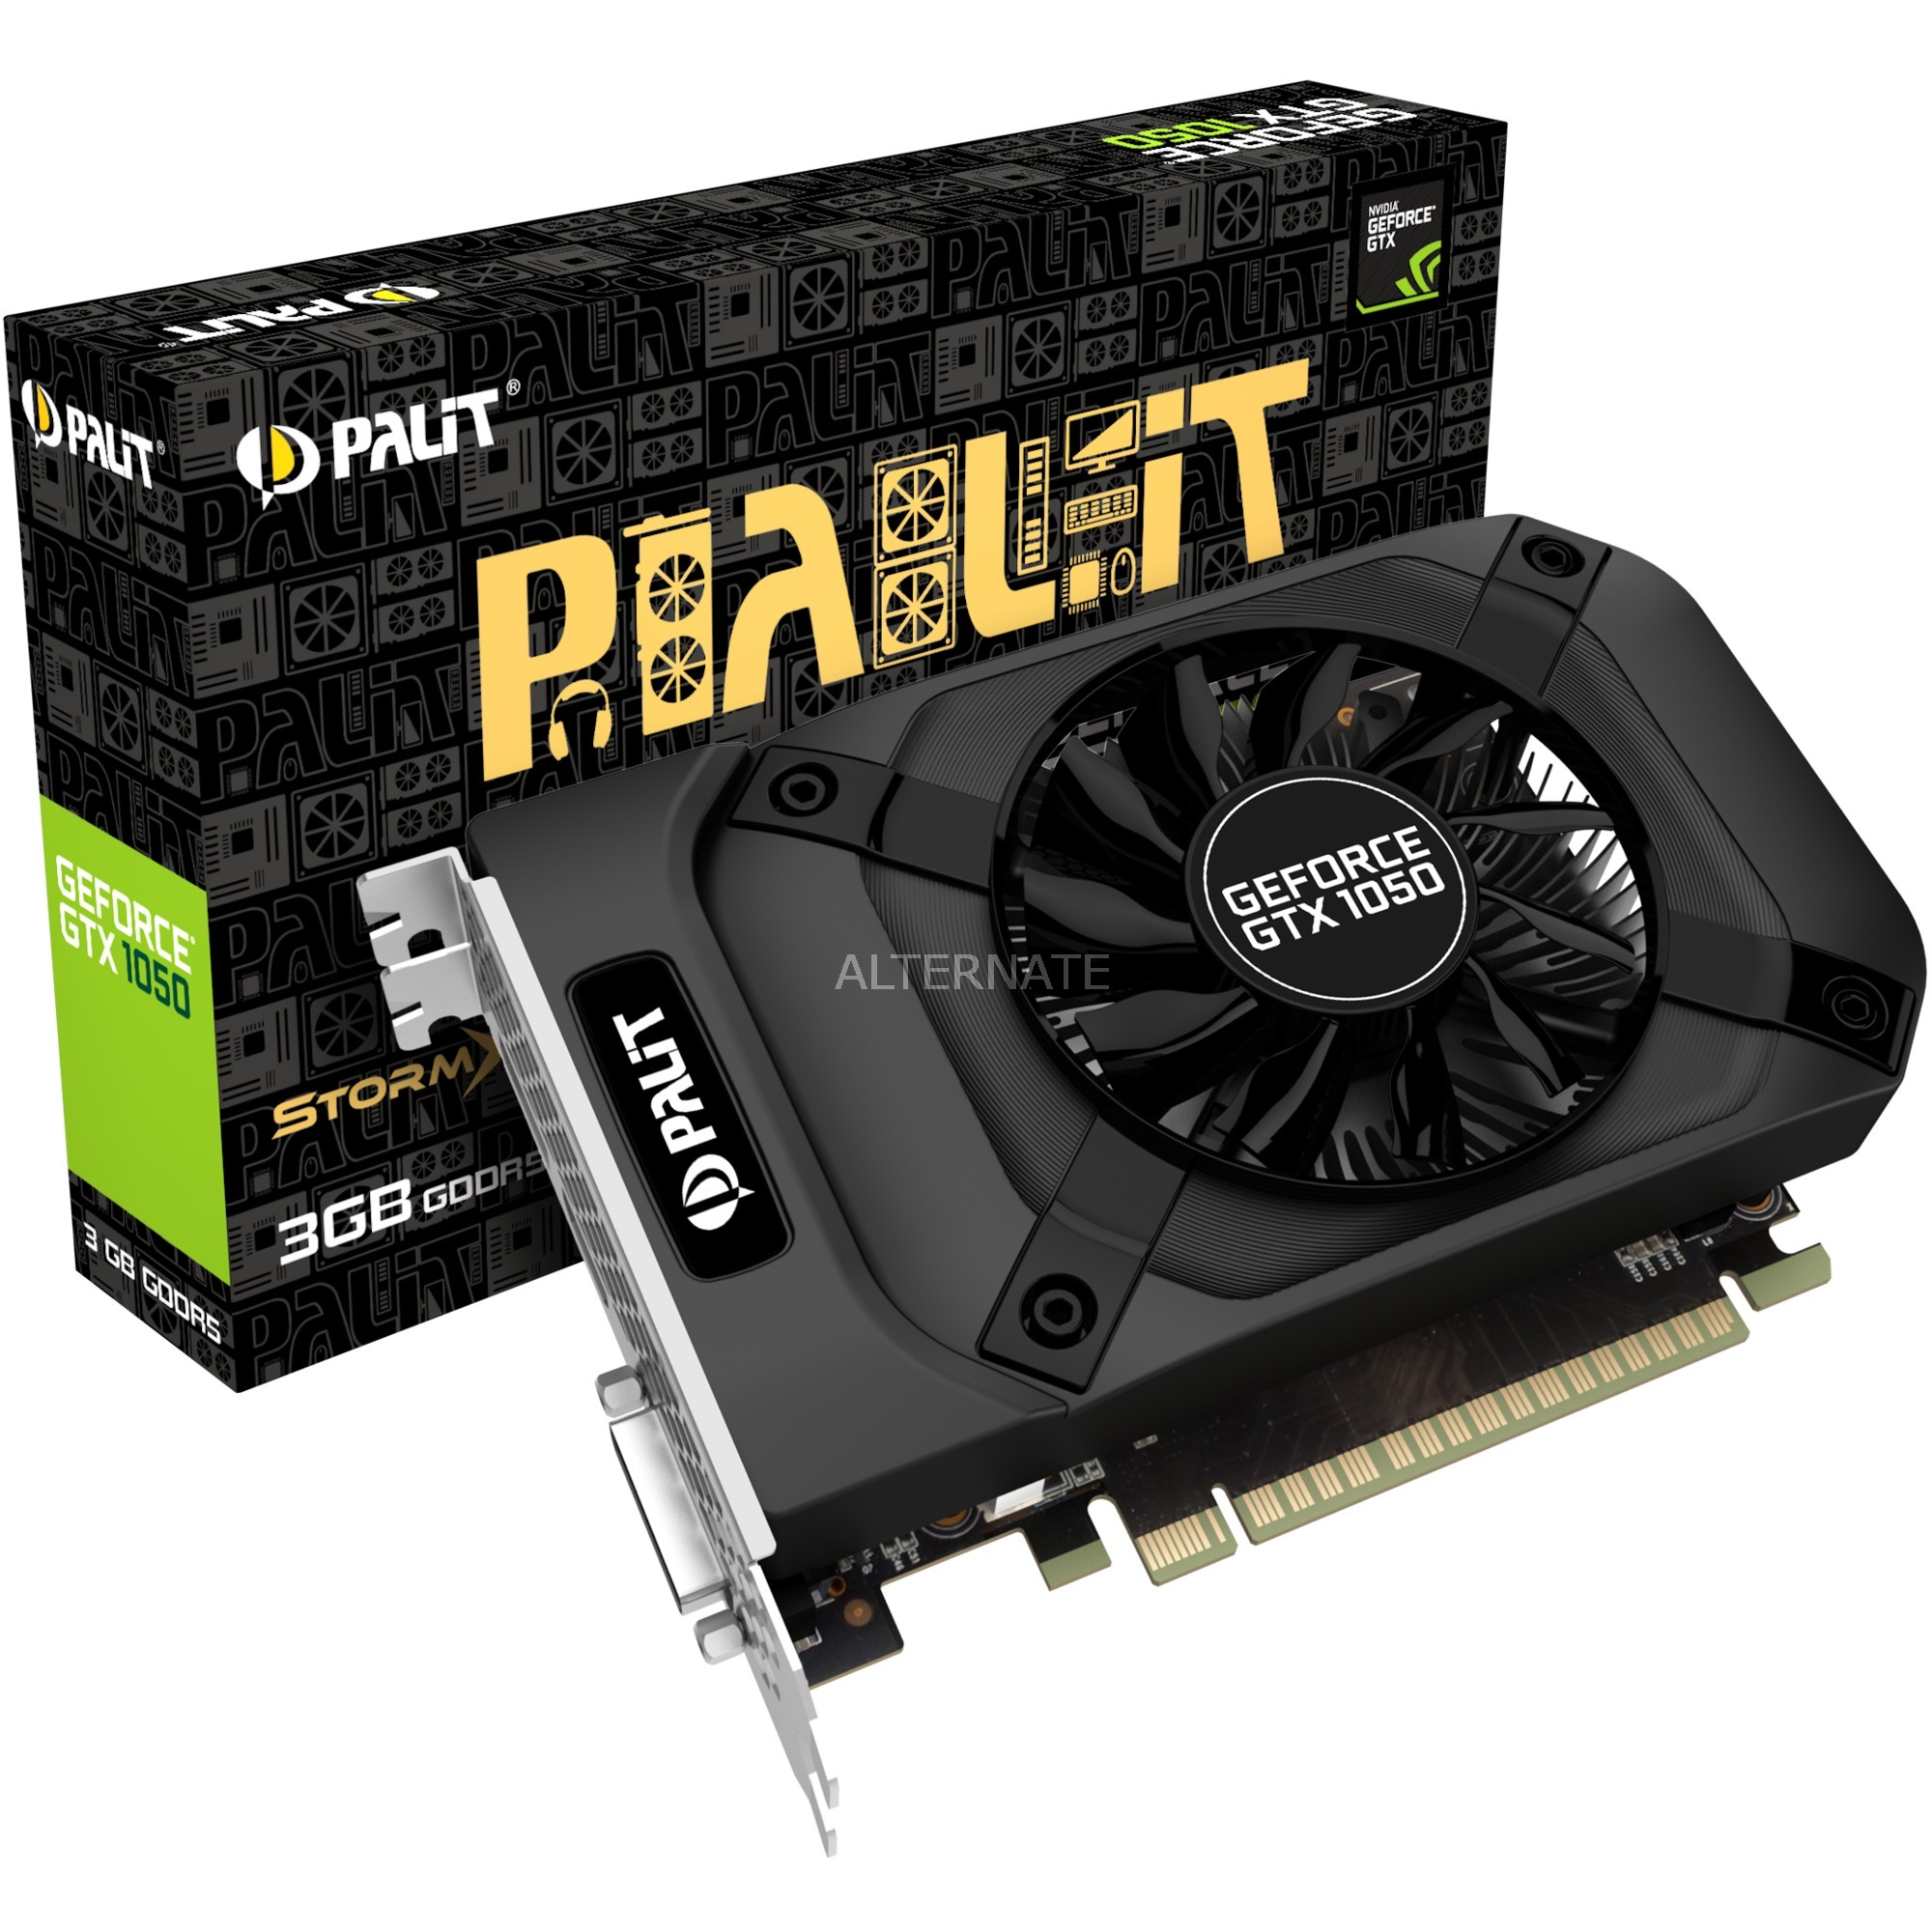 NE51050018FE-1070F GeForce GTX 1050 3GB GDDR5 tarjeta gráfica